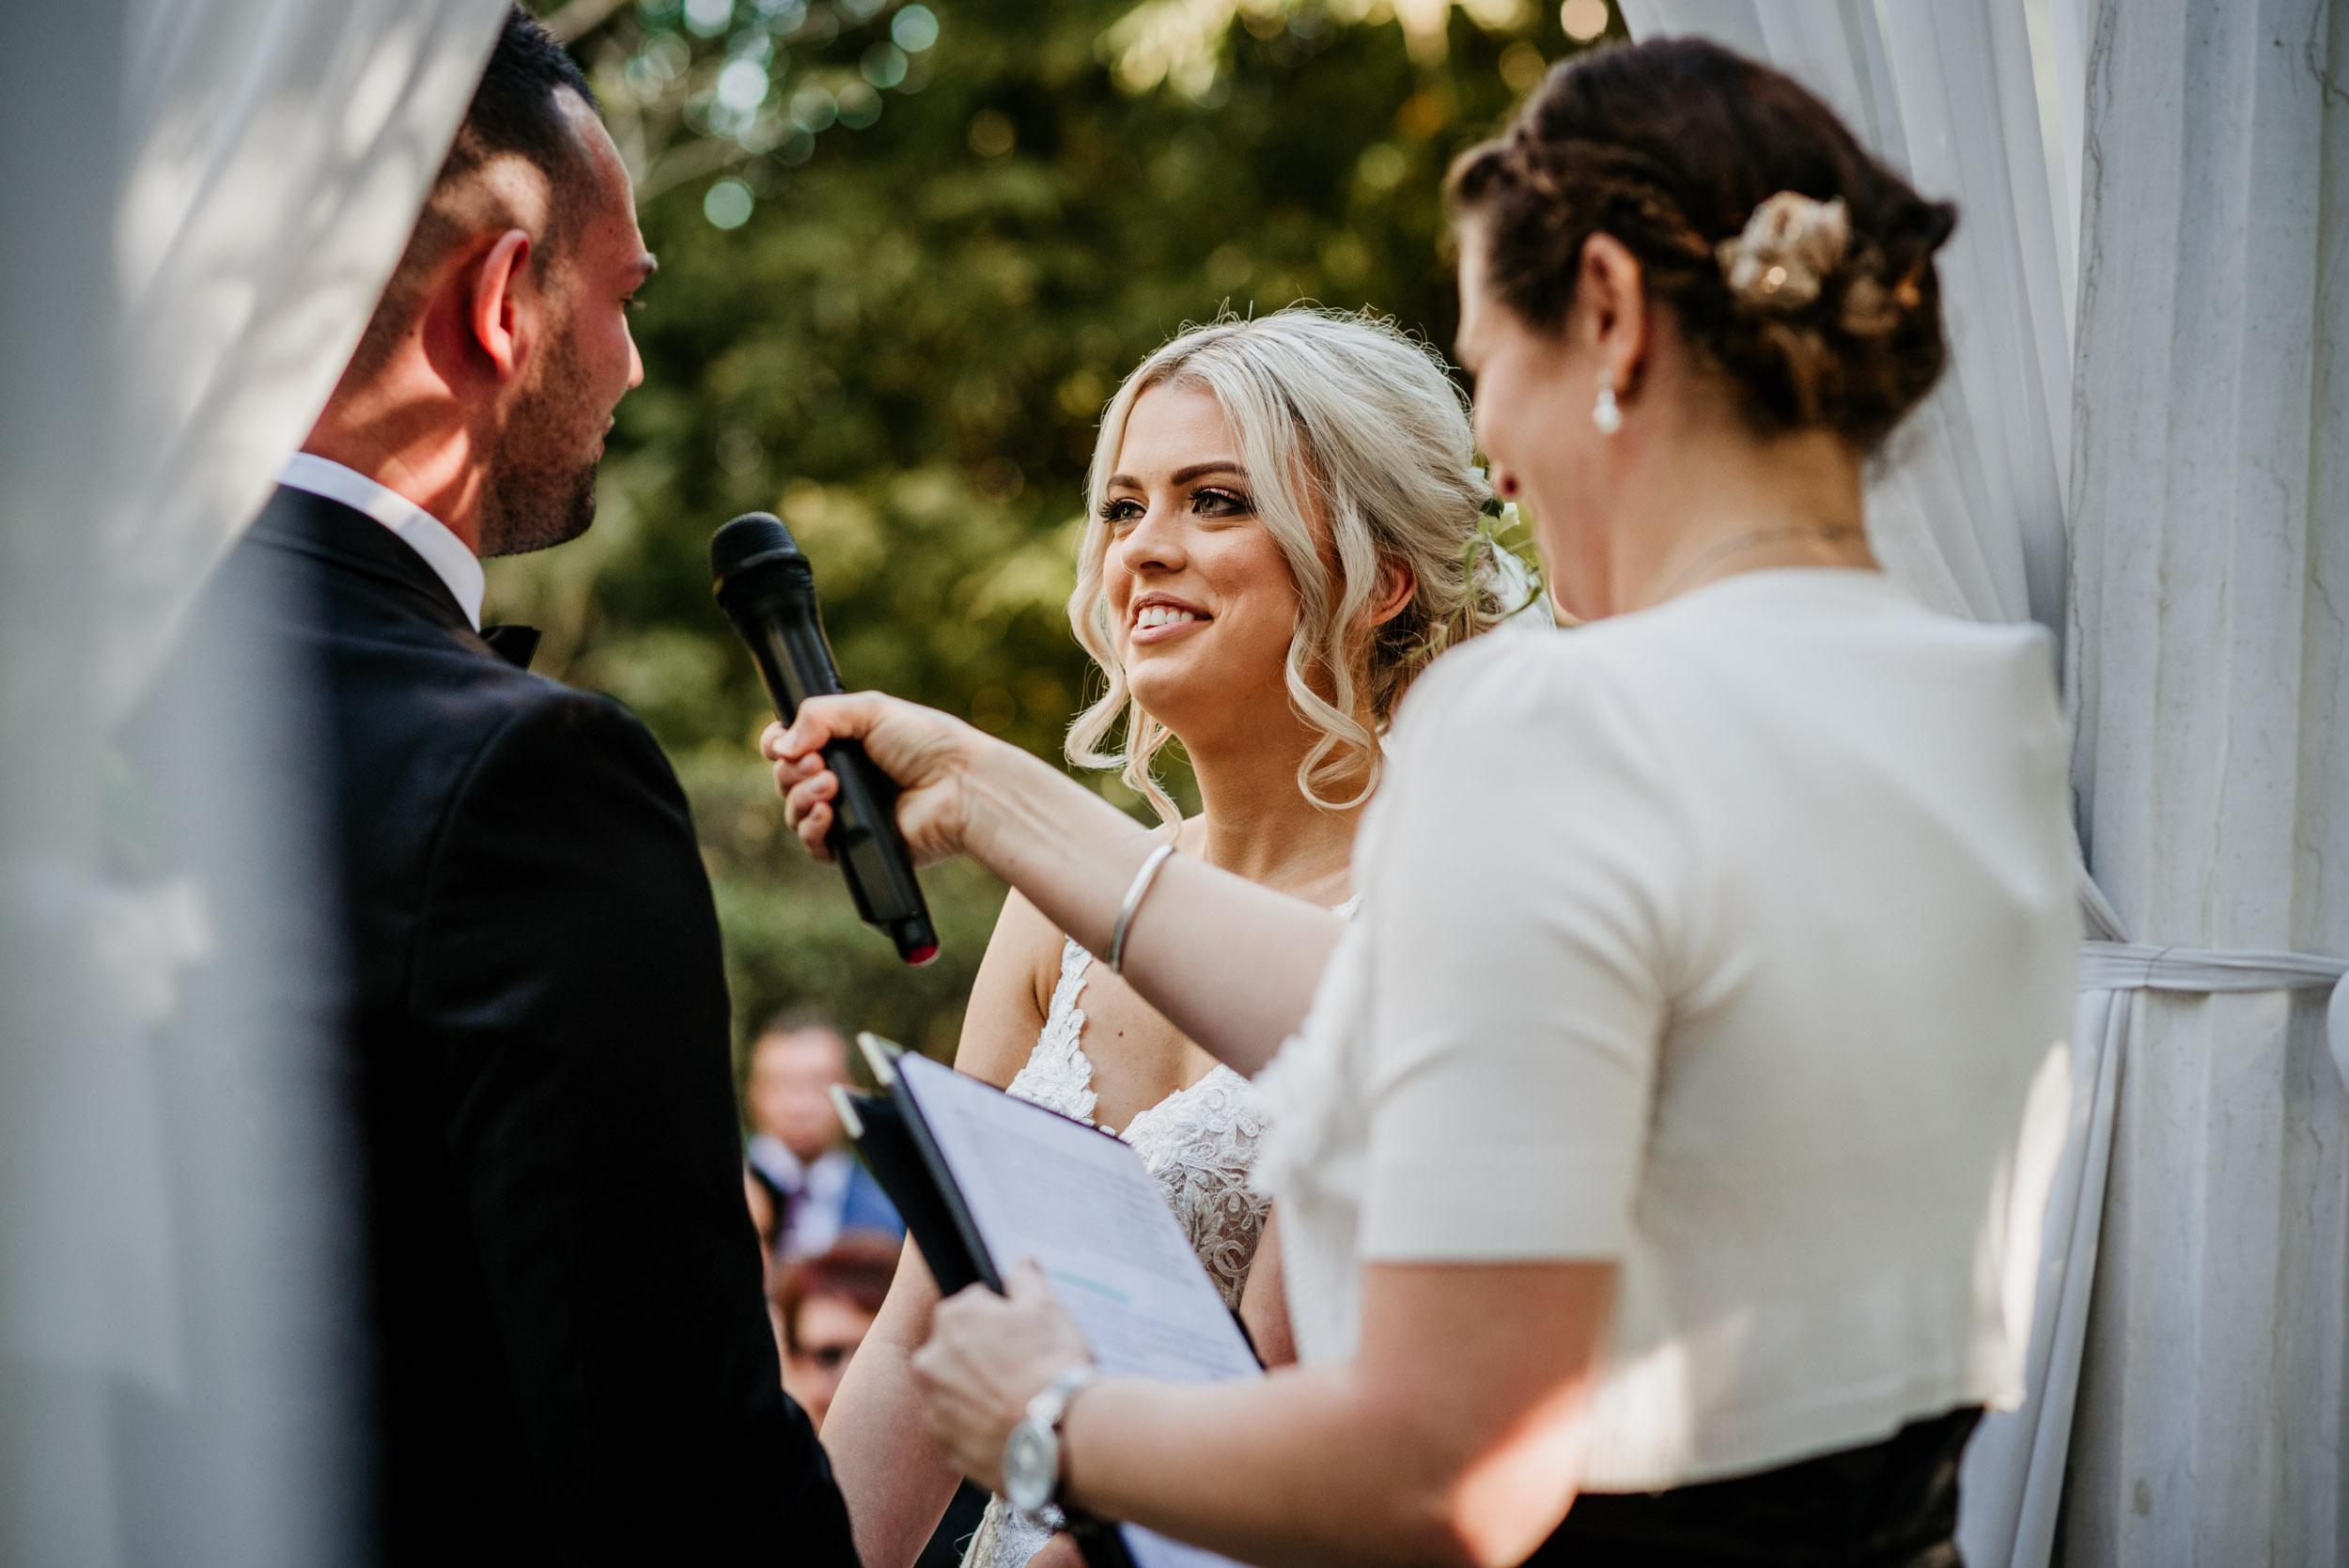 The Raw Photographer - Cairns Wedding Photographer - Laloli - Cairns Garden Wedding - Bride Dress - Destination Wed - Outdoor Reception - Queensland Ceremony-29.jpg